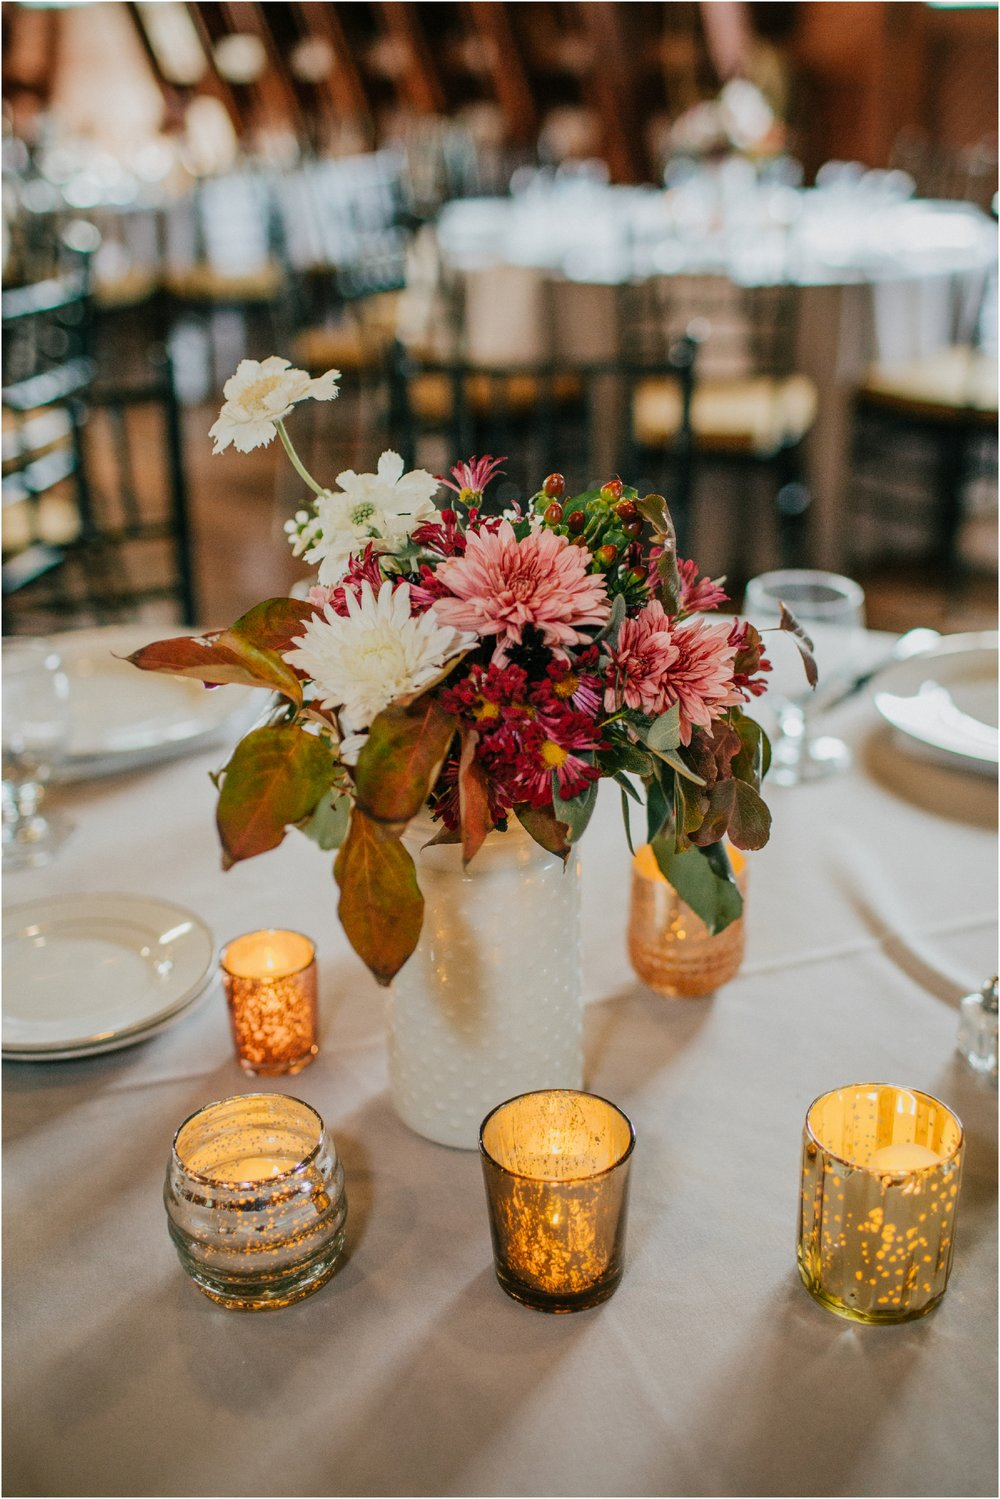 warm-springs-old-dairy-virginia-rustic-wedding-northeast-tennessee-elopement-adventuruous-photographer-katy-sergent_0107.jpg